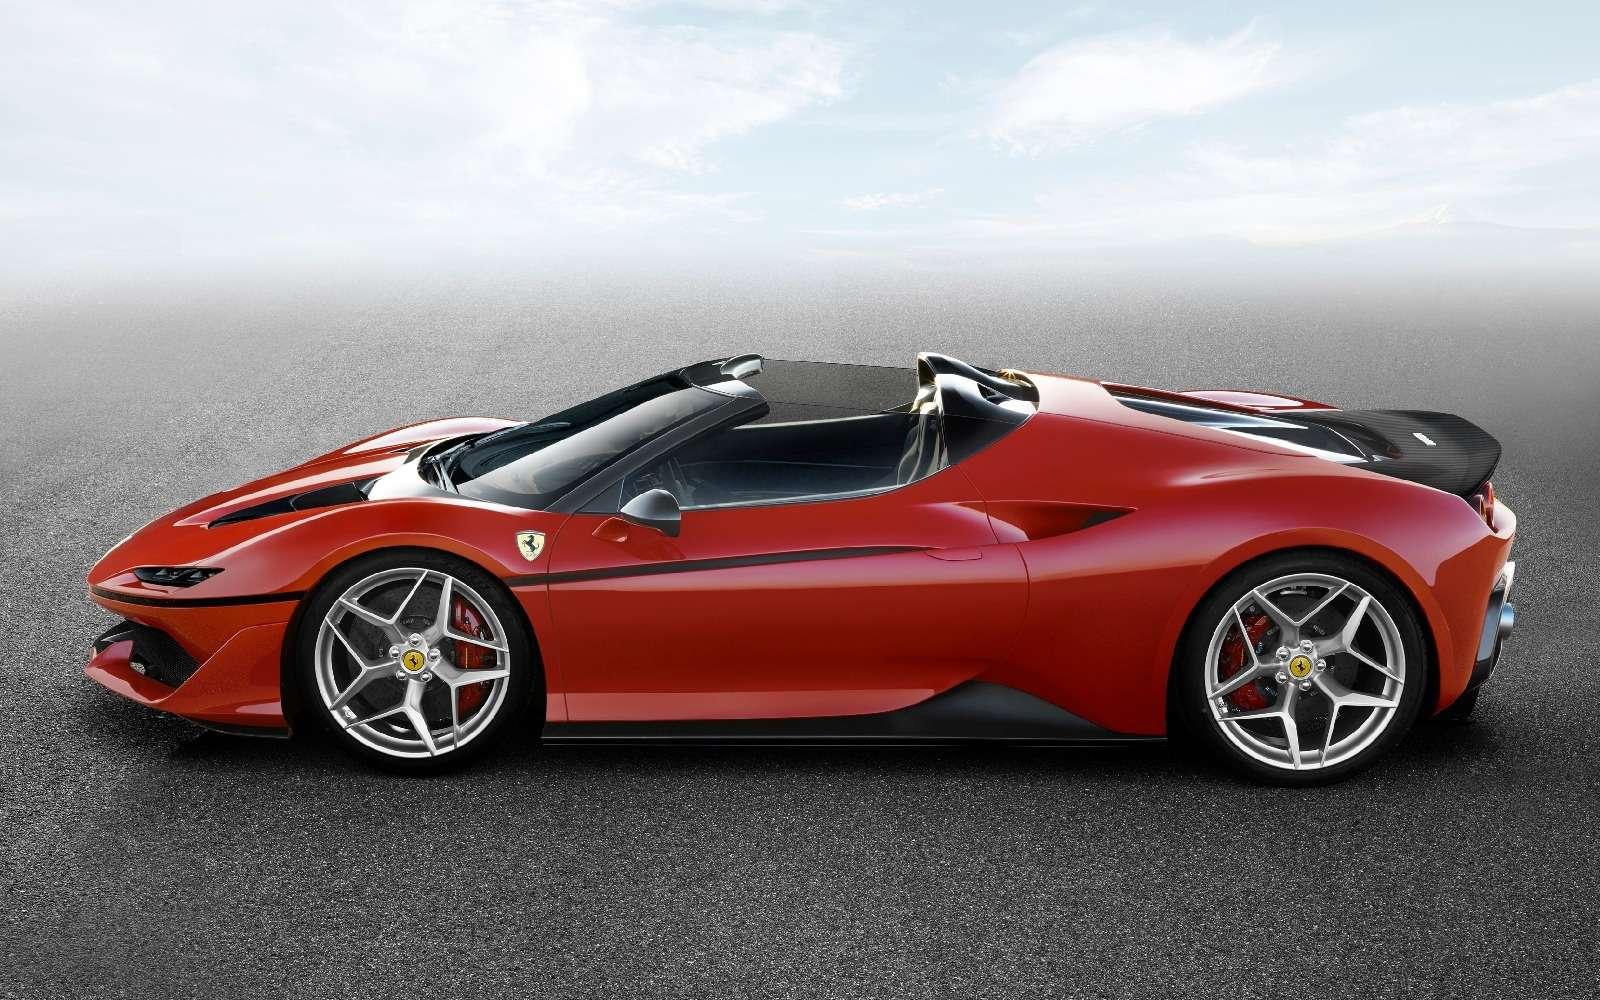 Япония вдохновляет: Ferrari представила юбилейную таргу J50— фото 677908